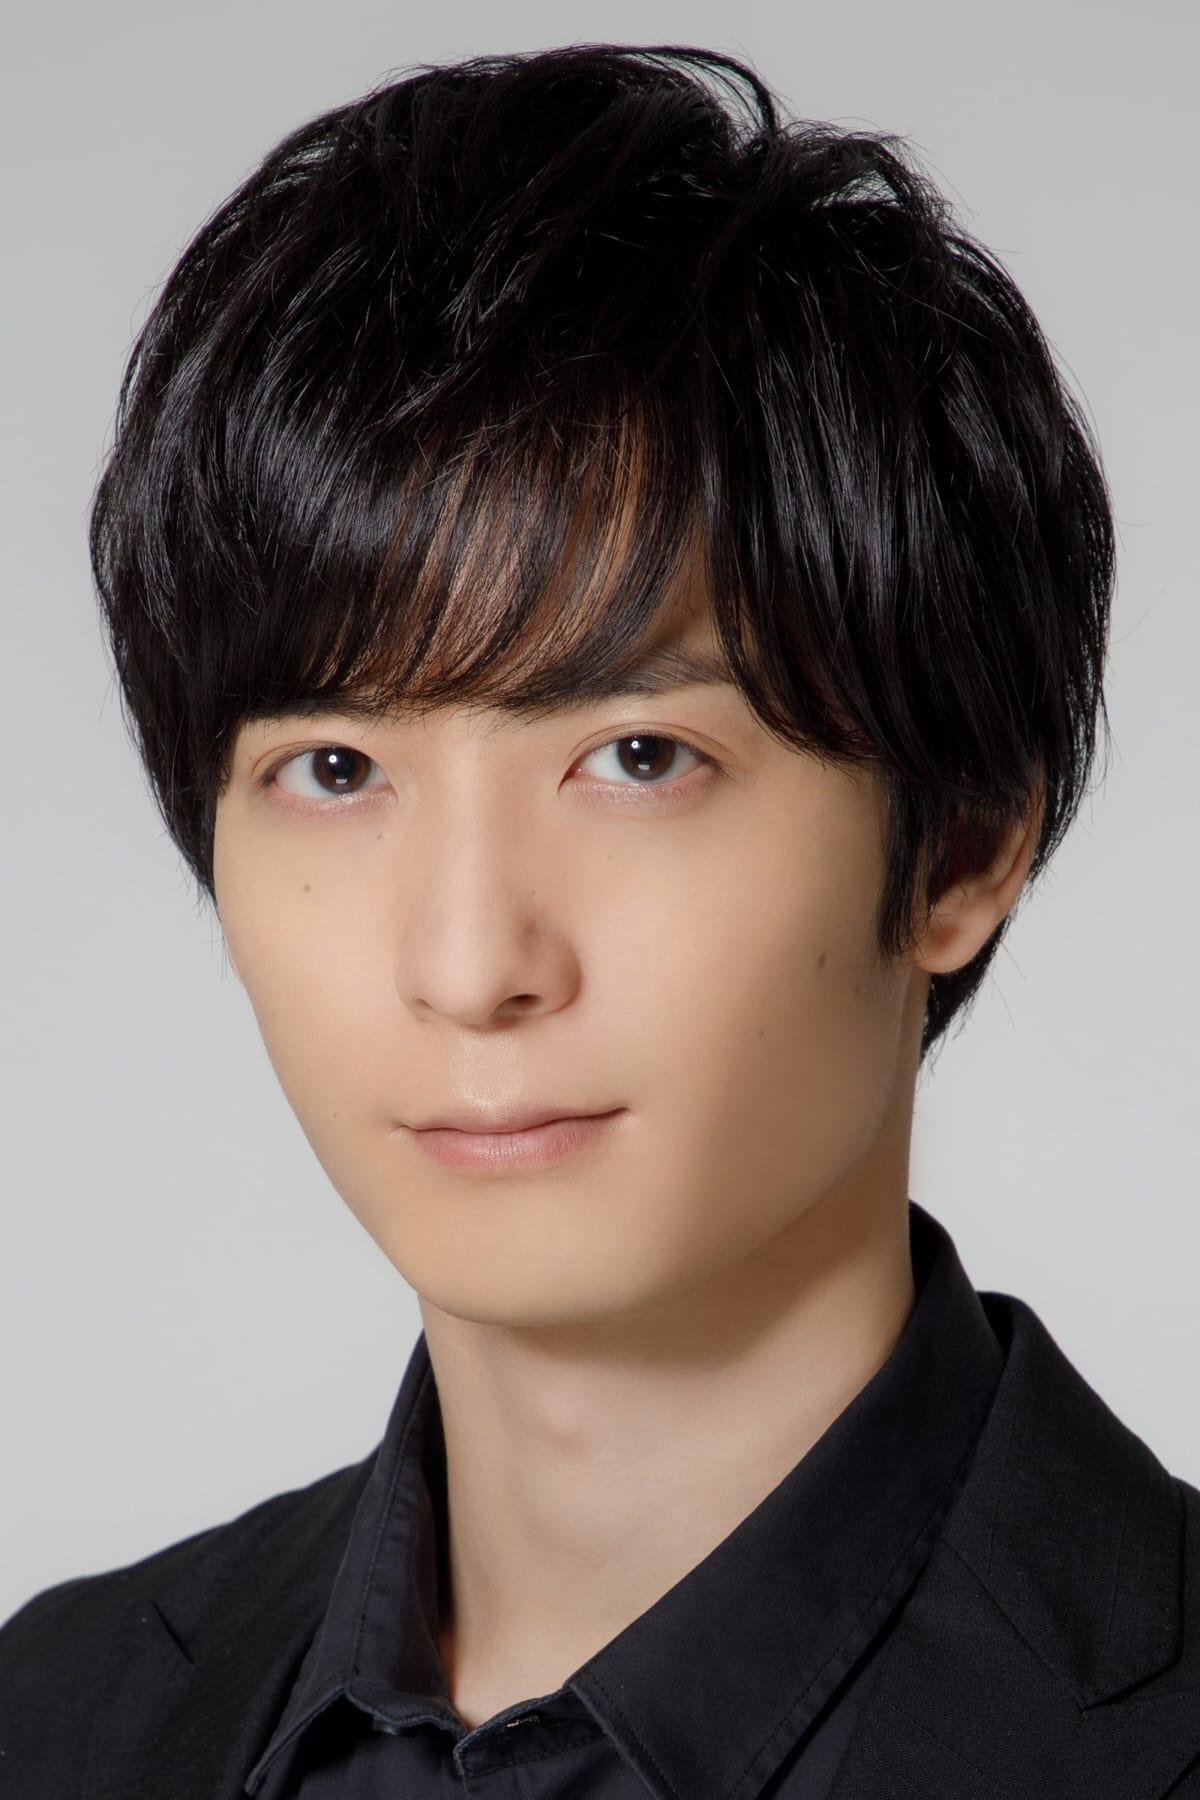 Yūichirō Umehara